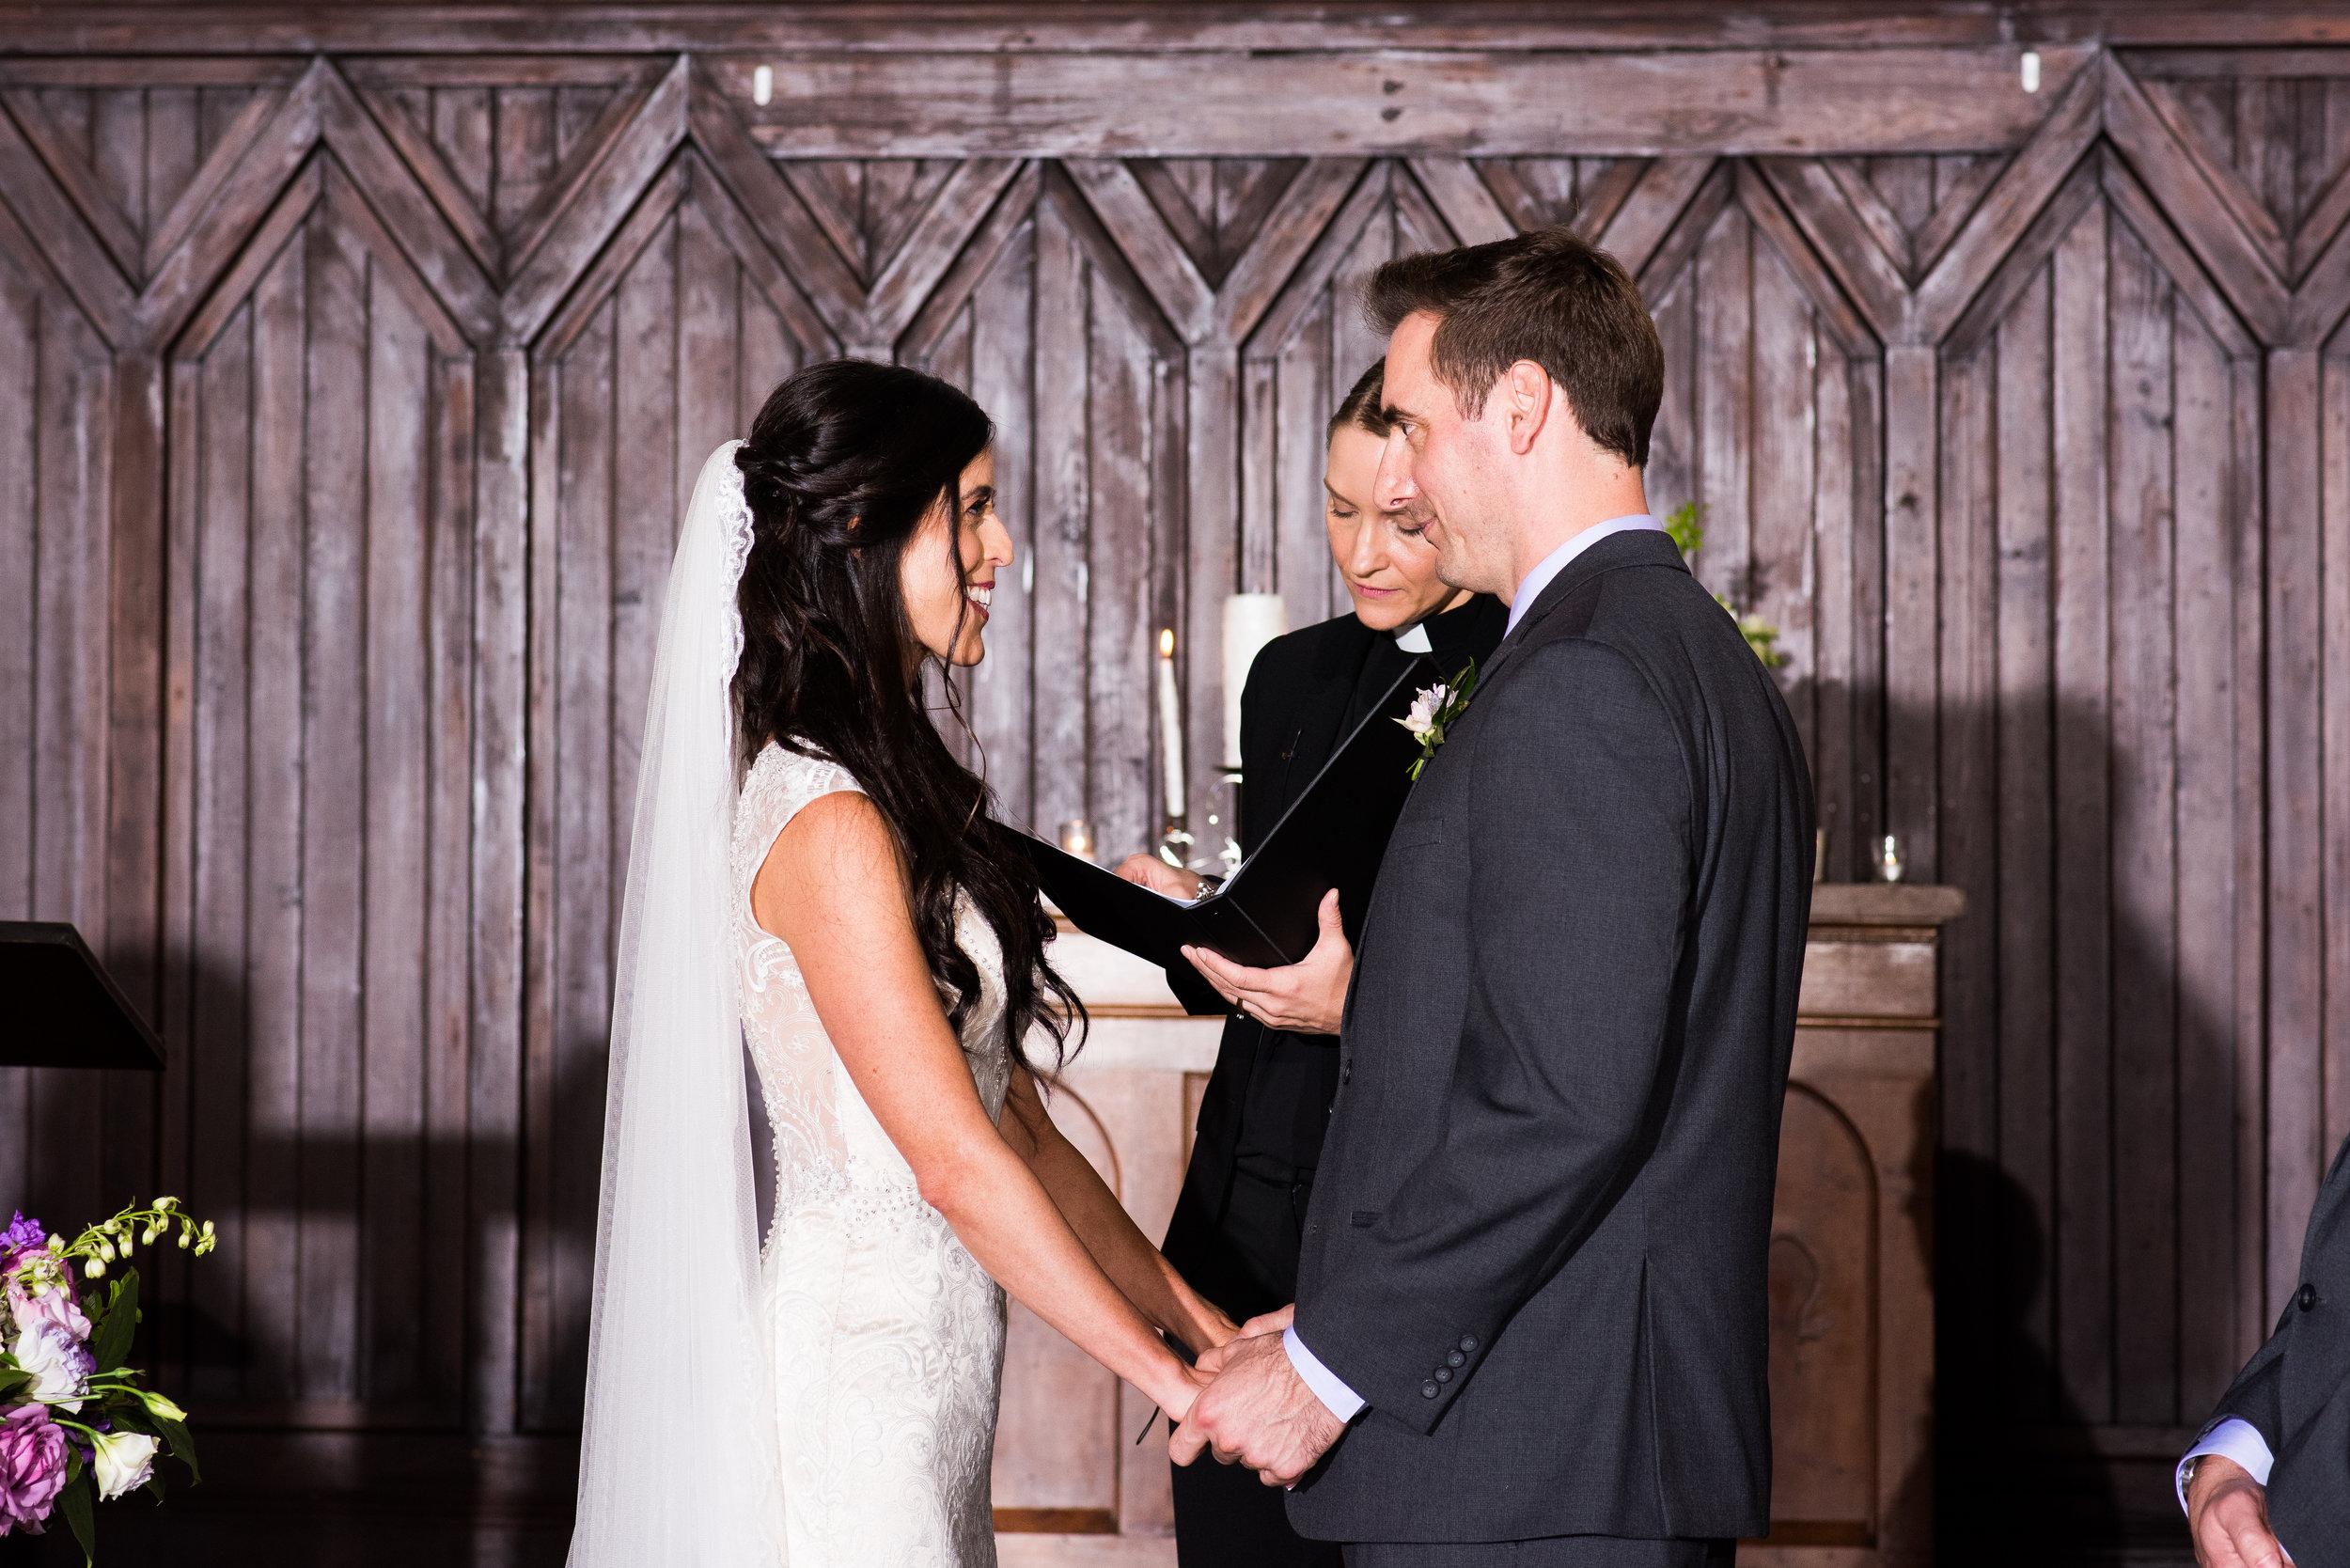 Heather & Lincoln Groves Wedding SP WEB_64.jpg